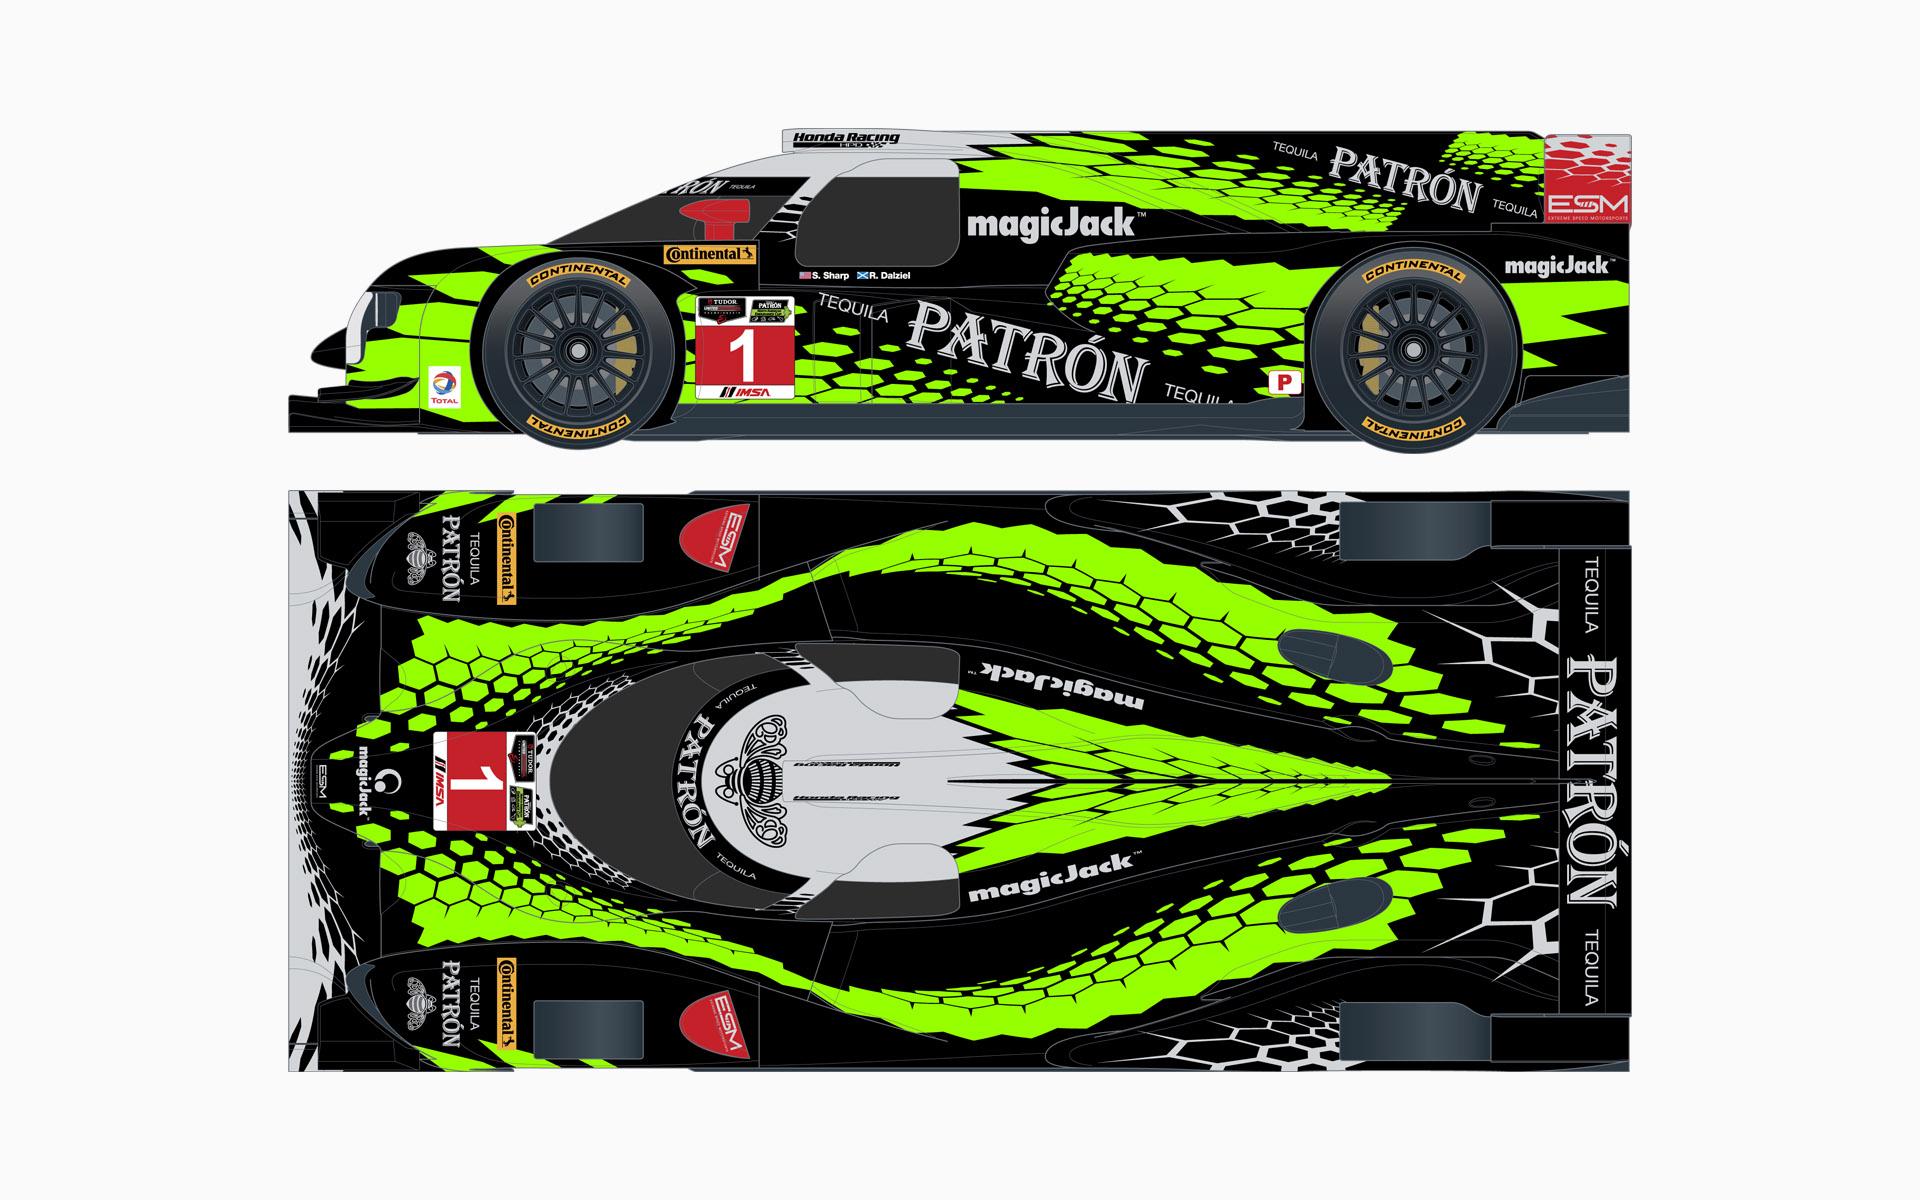 2015 Extreme Speed Motorsports Pátron HPD ARX-04b LMP2 Livery Elevations